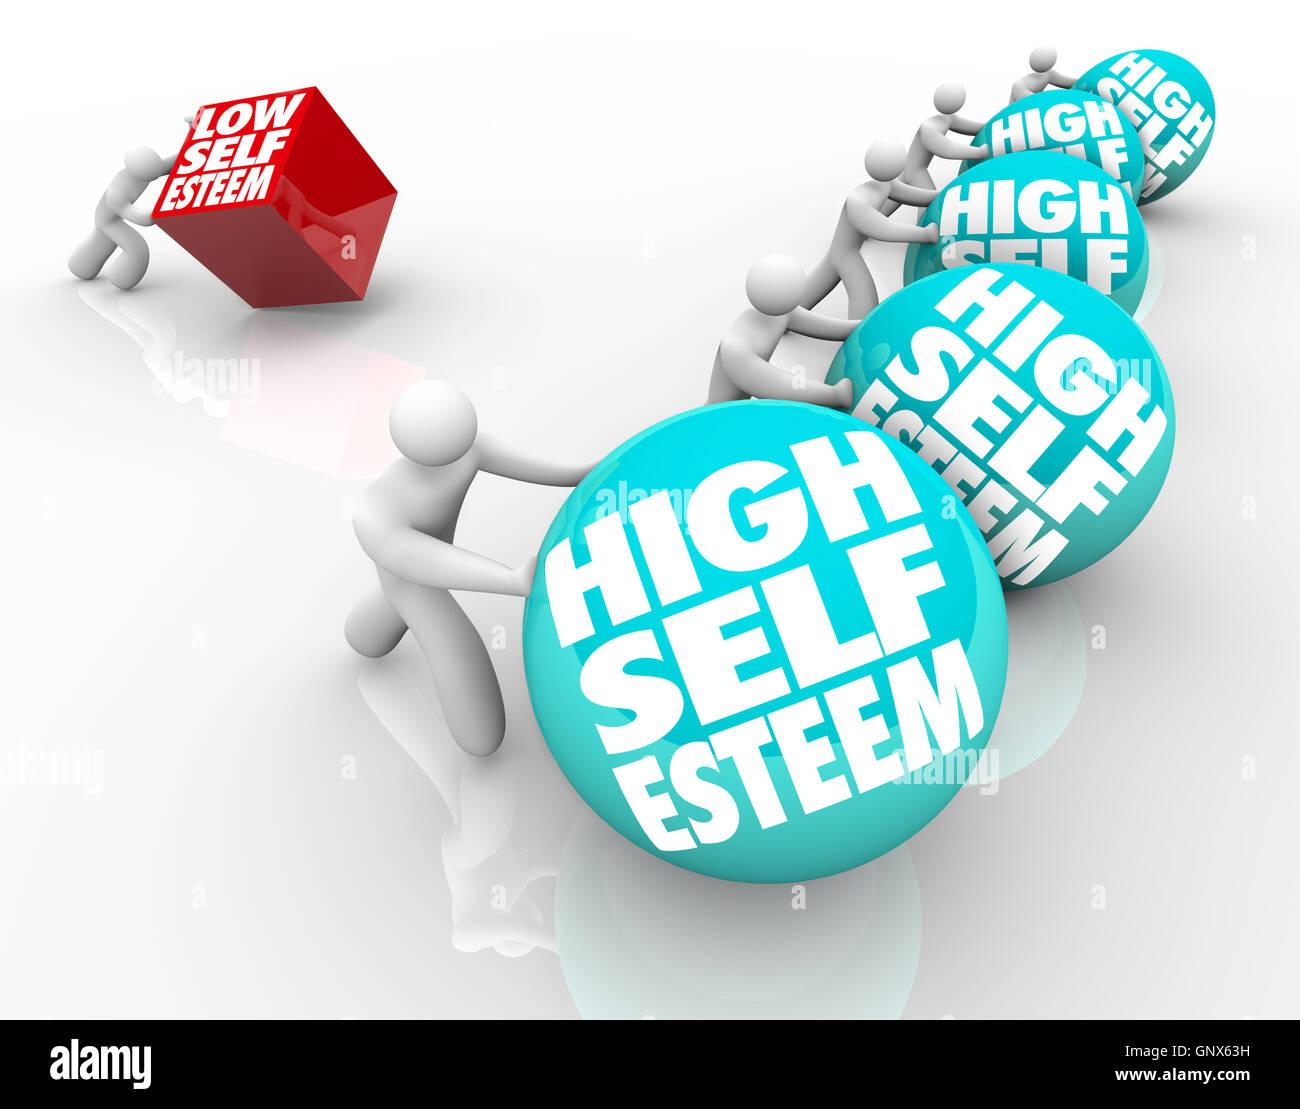 High Vs Low Self Esteem Losing Race of Confidence Attitude - Stock Image